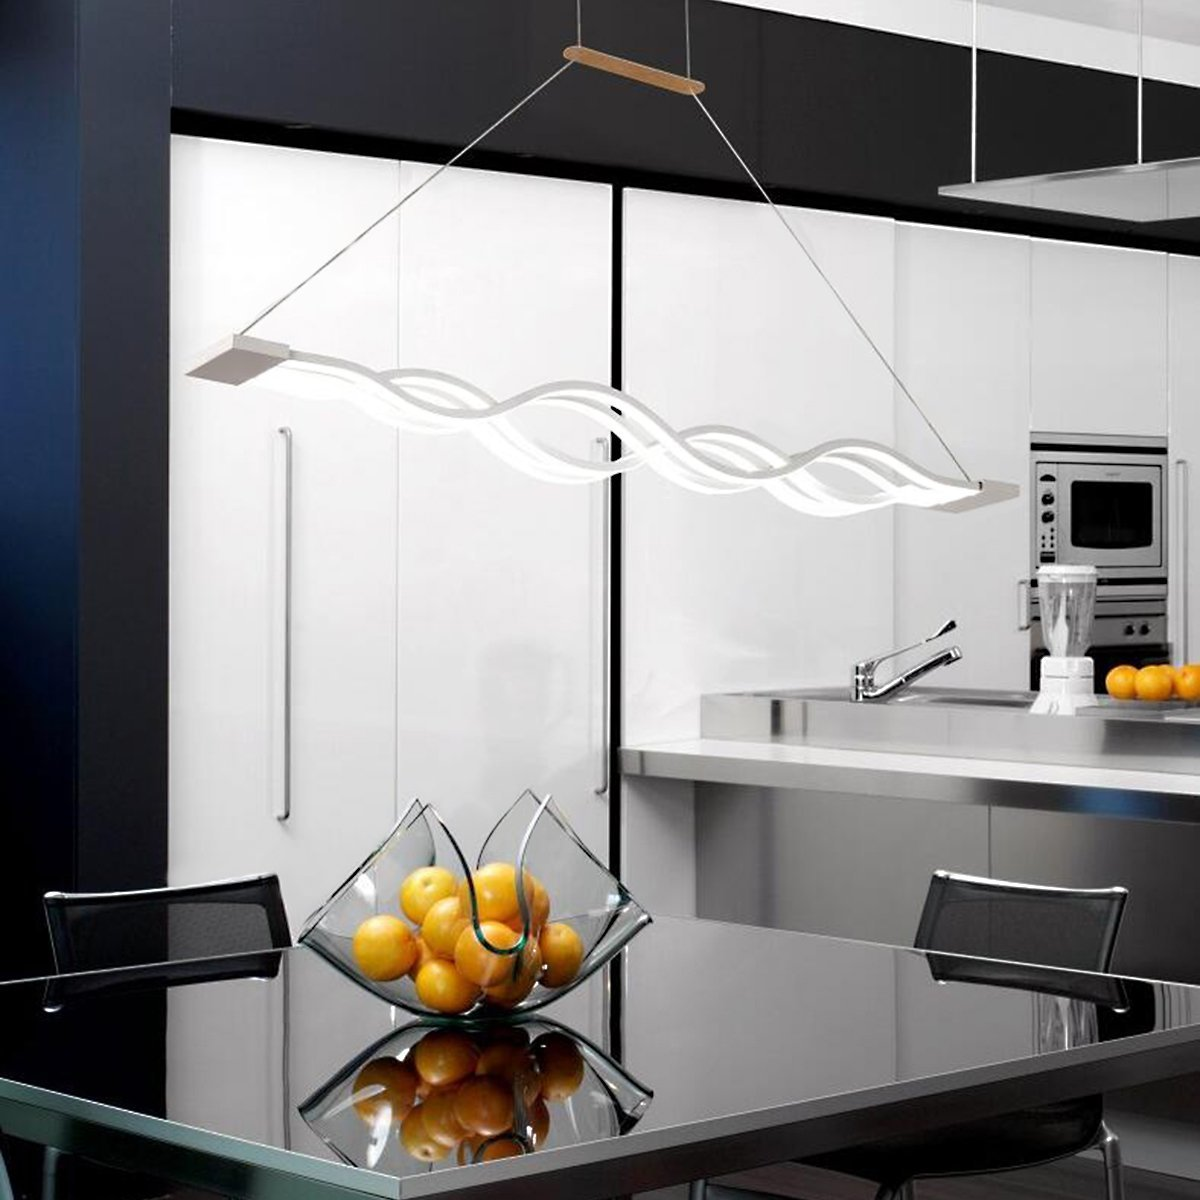 kjlars led pendelleuchte esstisch hngelampe wohnzimmer kche led pendellampe moderne aluminium hngeleuchte hhenverstellbar pendellnge maximum 120cm - Hangeleuchte Wohnzimmer Led